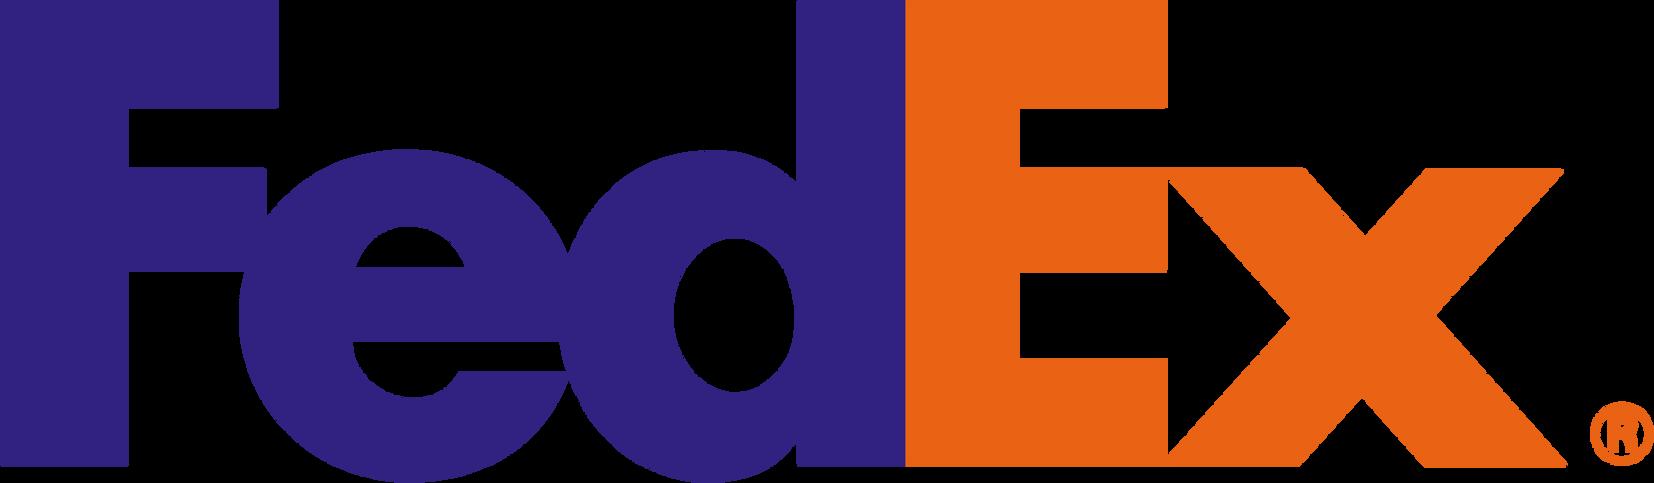 Fedex Ground Logo Png | www.imgkid.com - The Image Kid Has It!